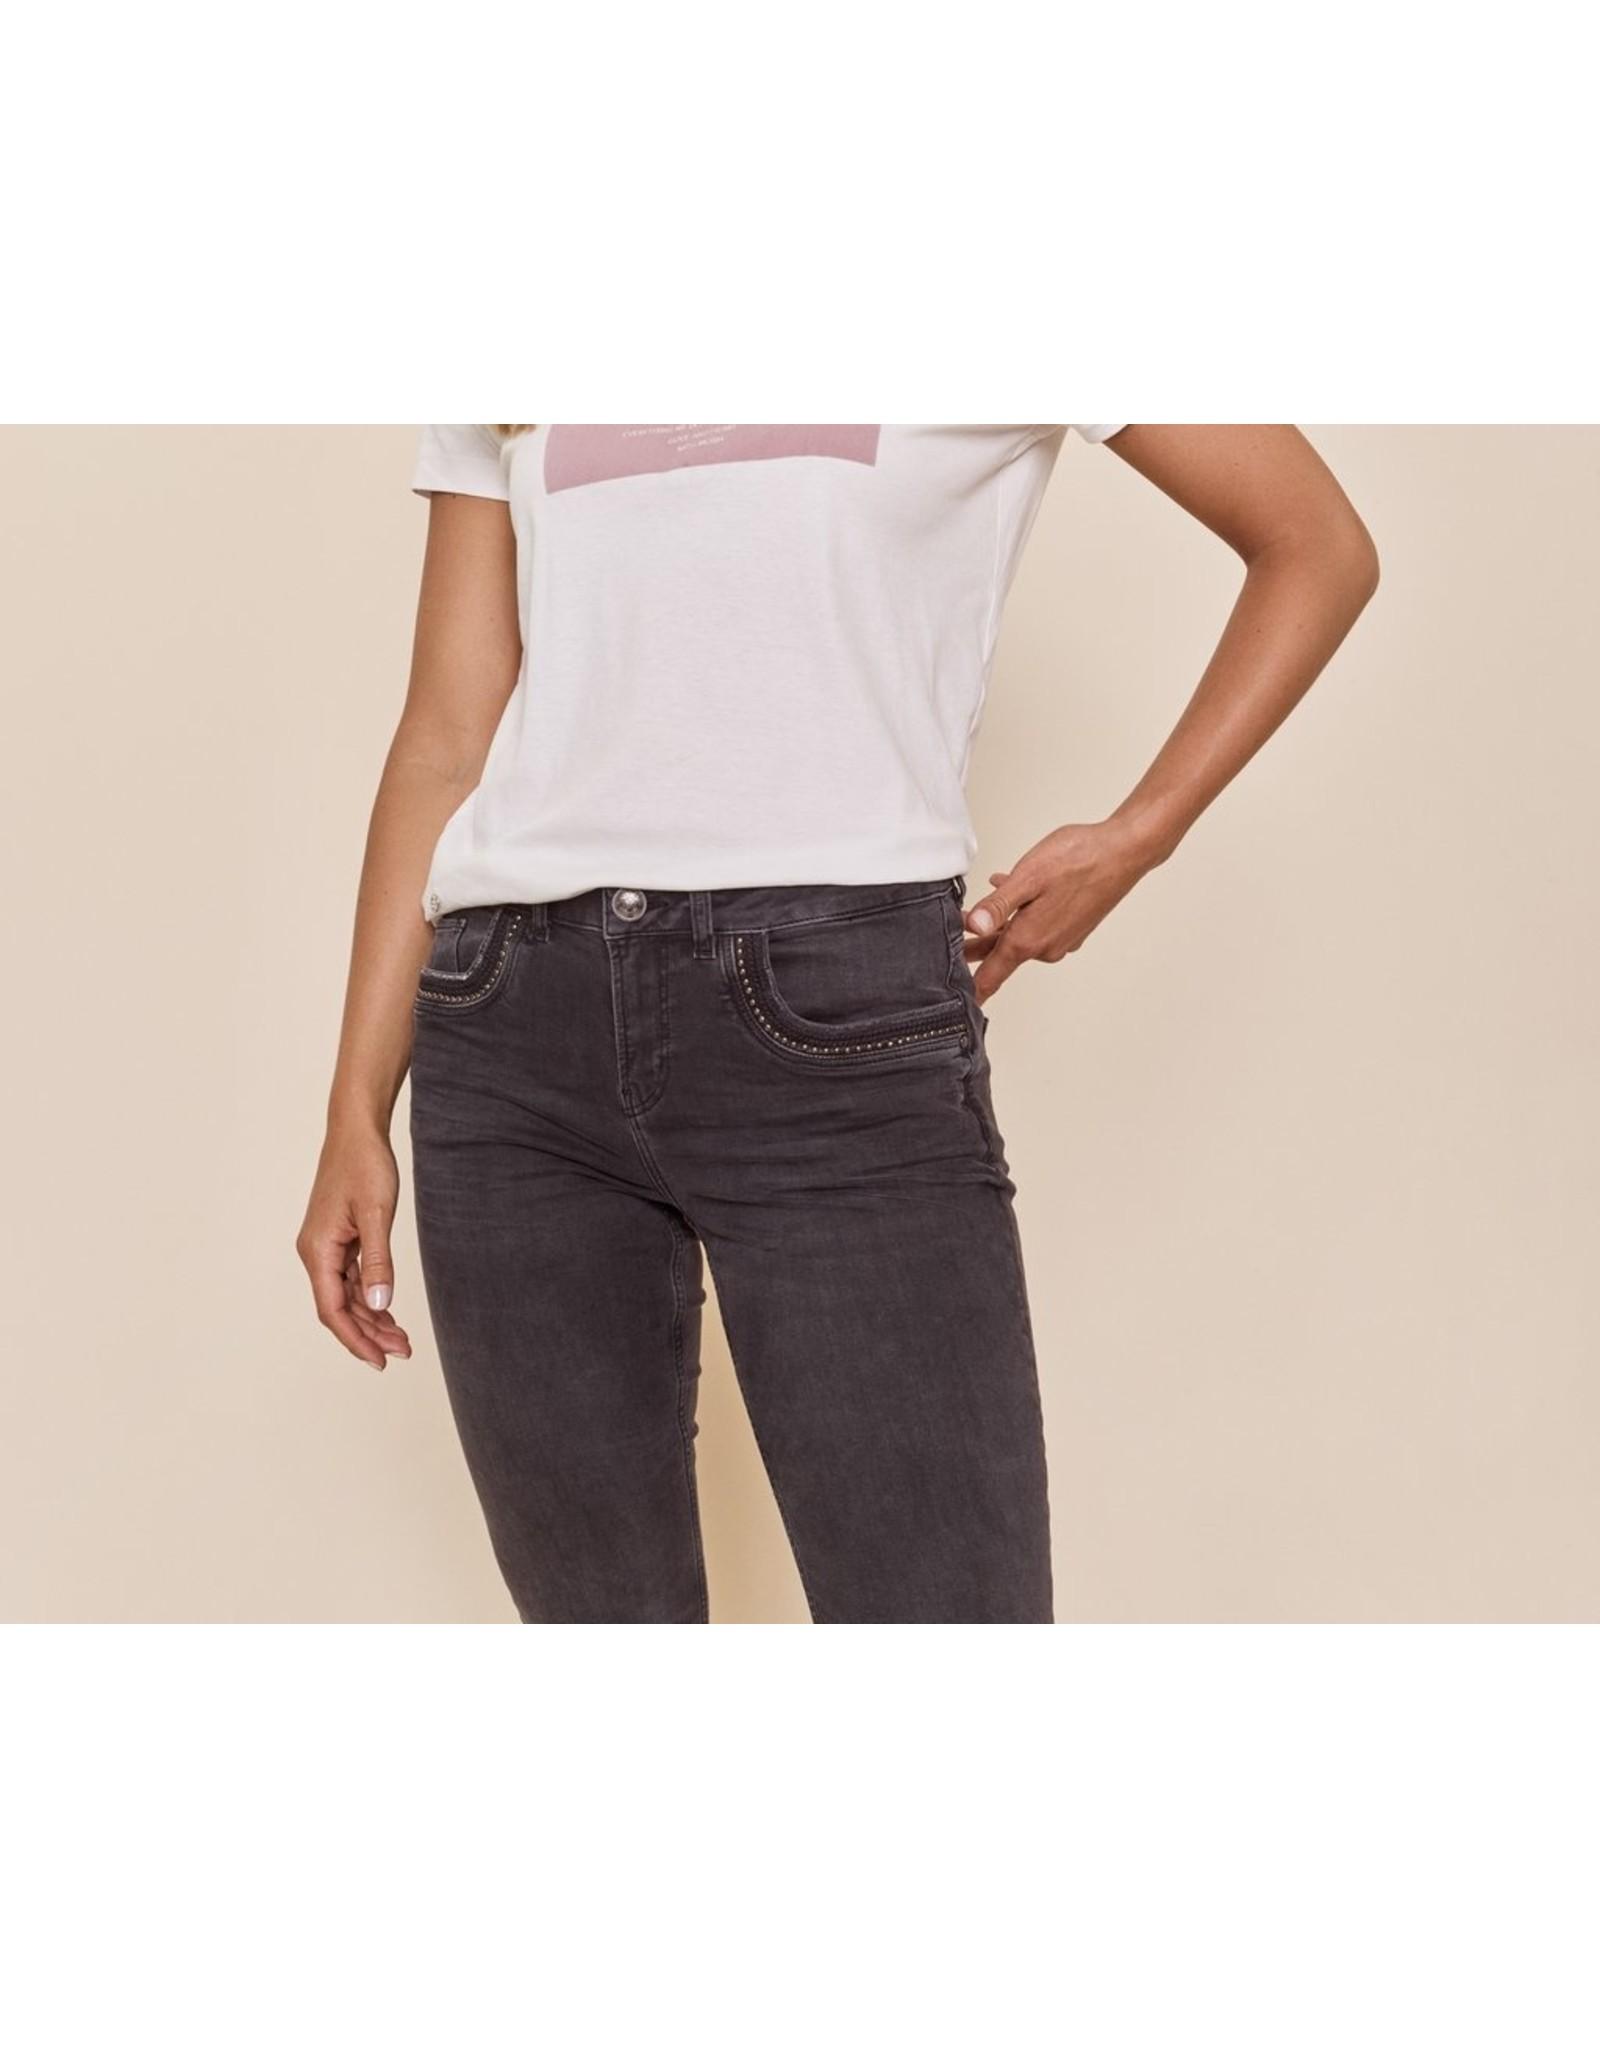 Mos Mosh 140380 -Bradford Moon Jeans